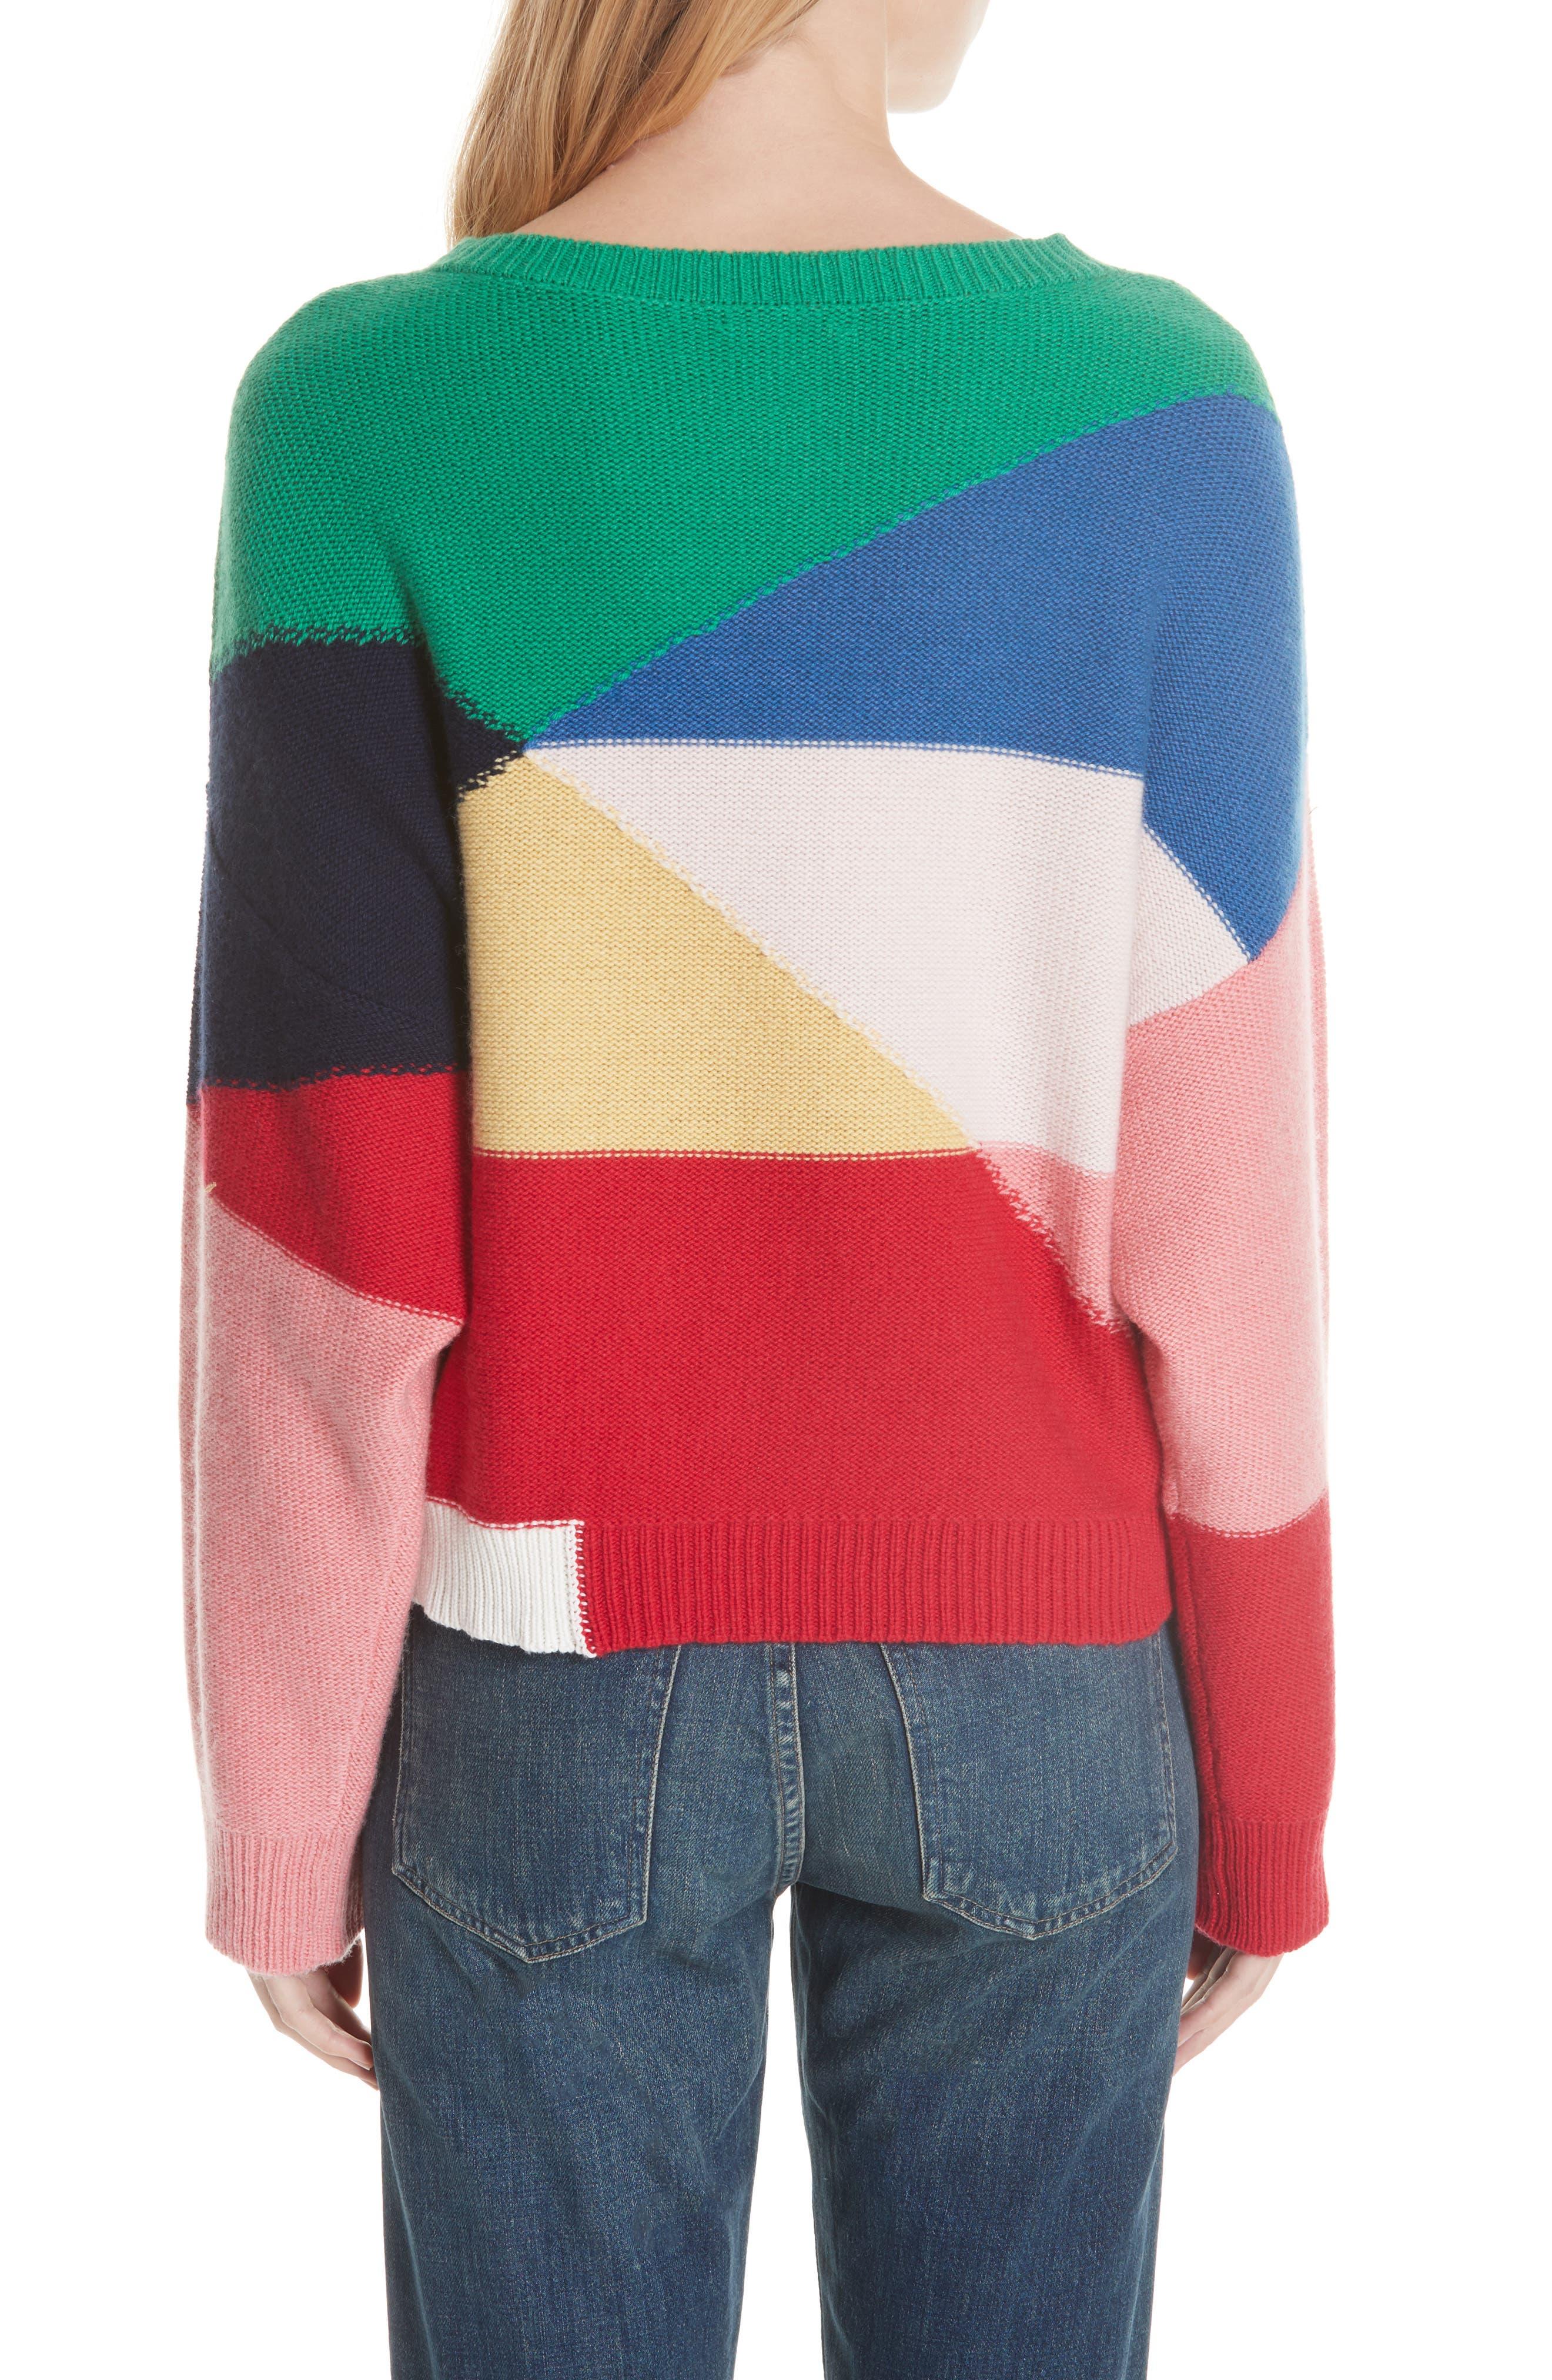 Megu Colorblock Wool & Cashmere Sweater,                             Alternate thumbnail 2, color,                             Multi